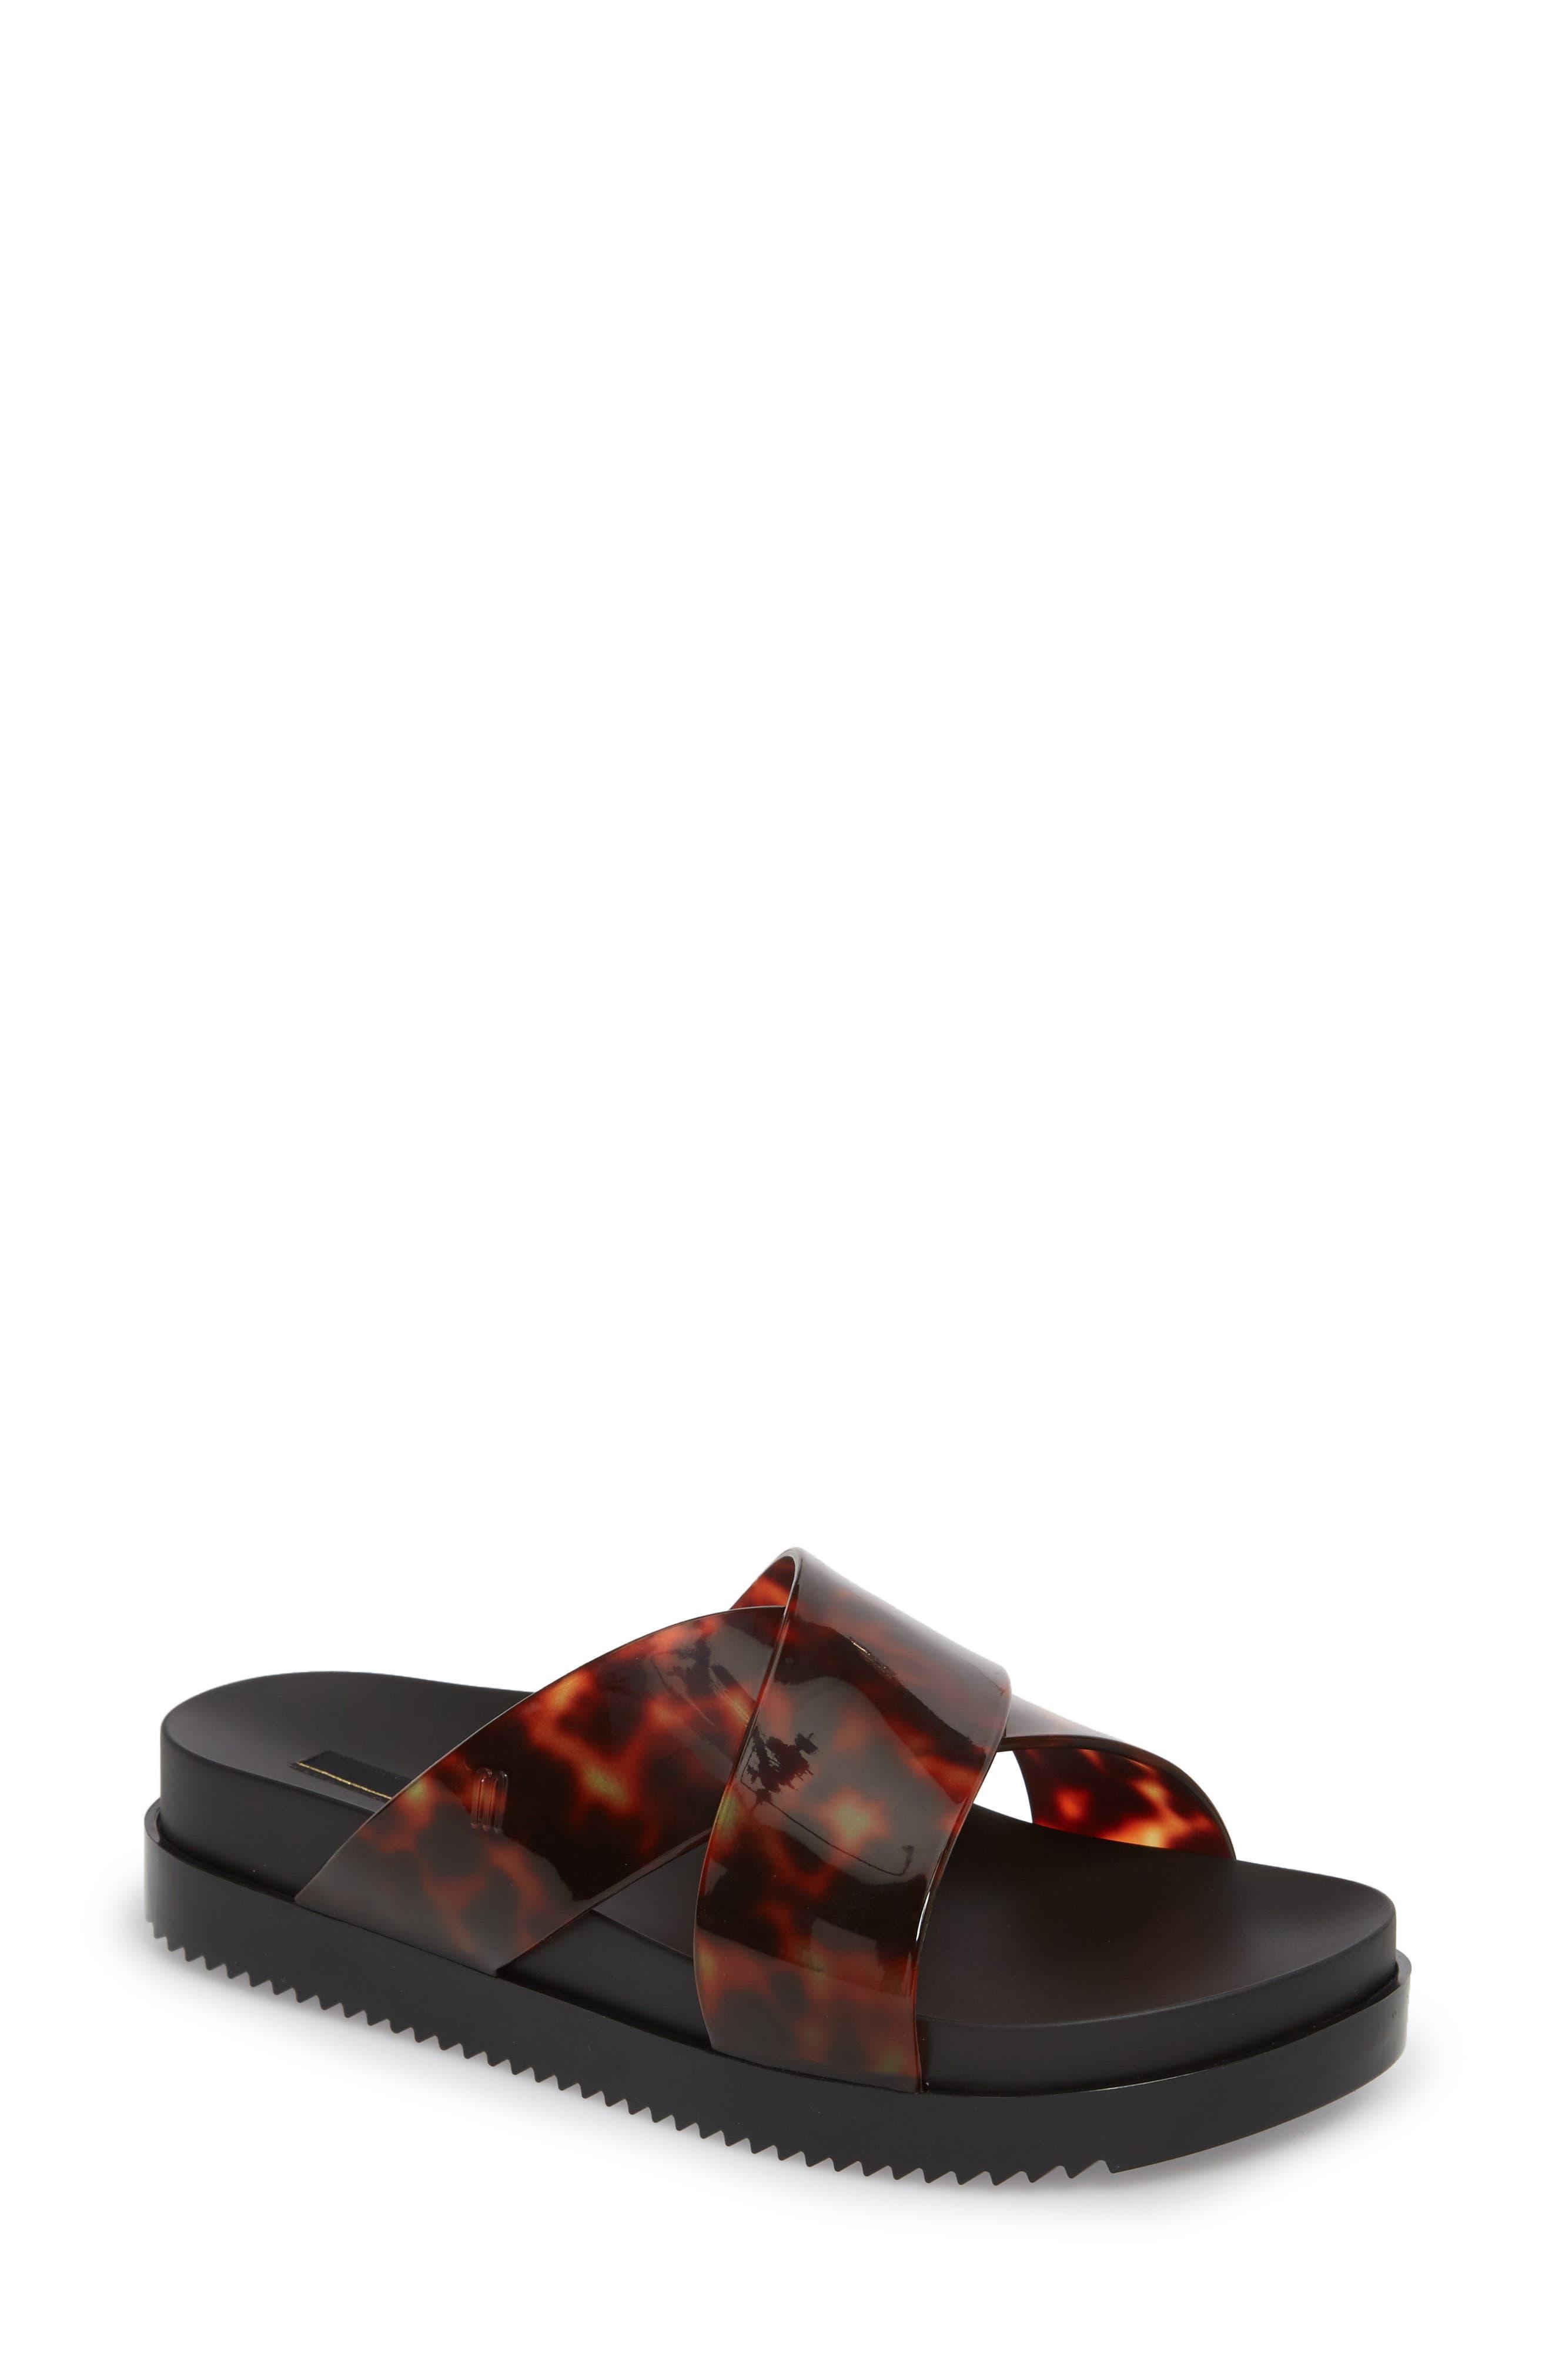 Alternate Image 1 Selected - Melissa Cosmic II Sandal (Women)